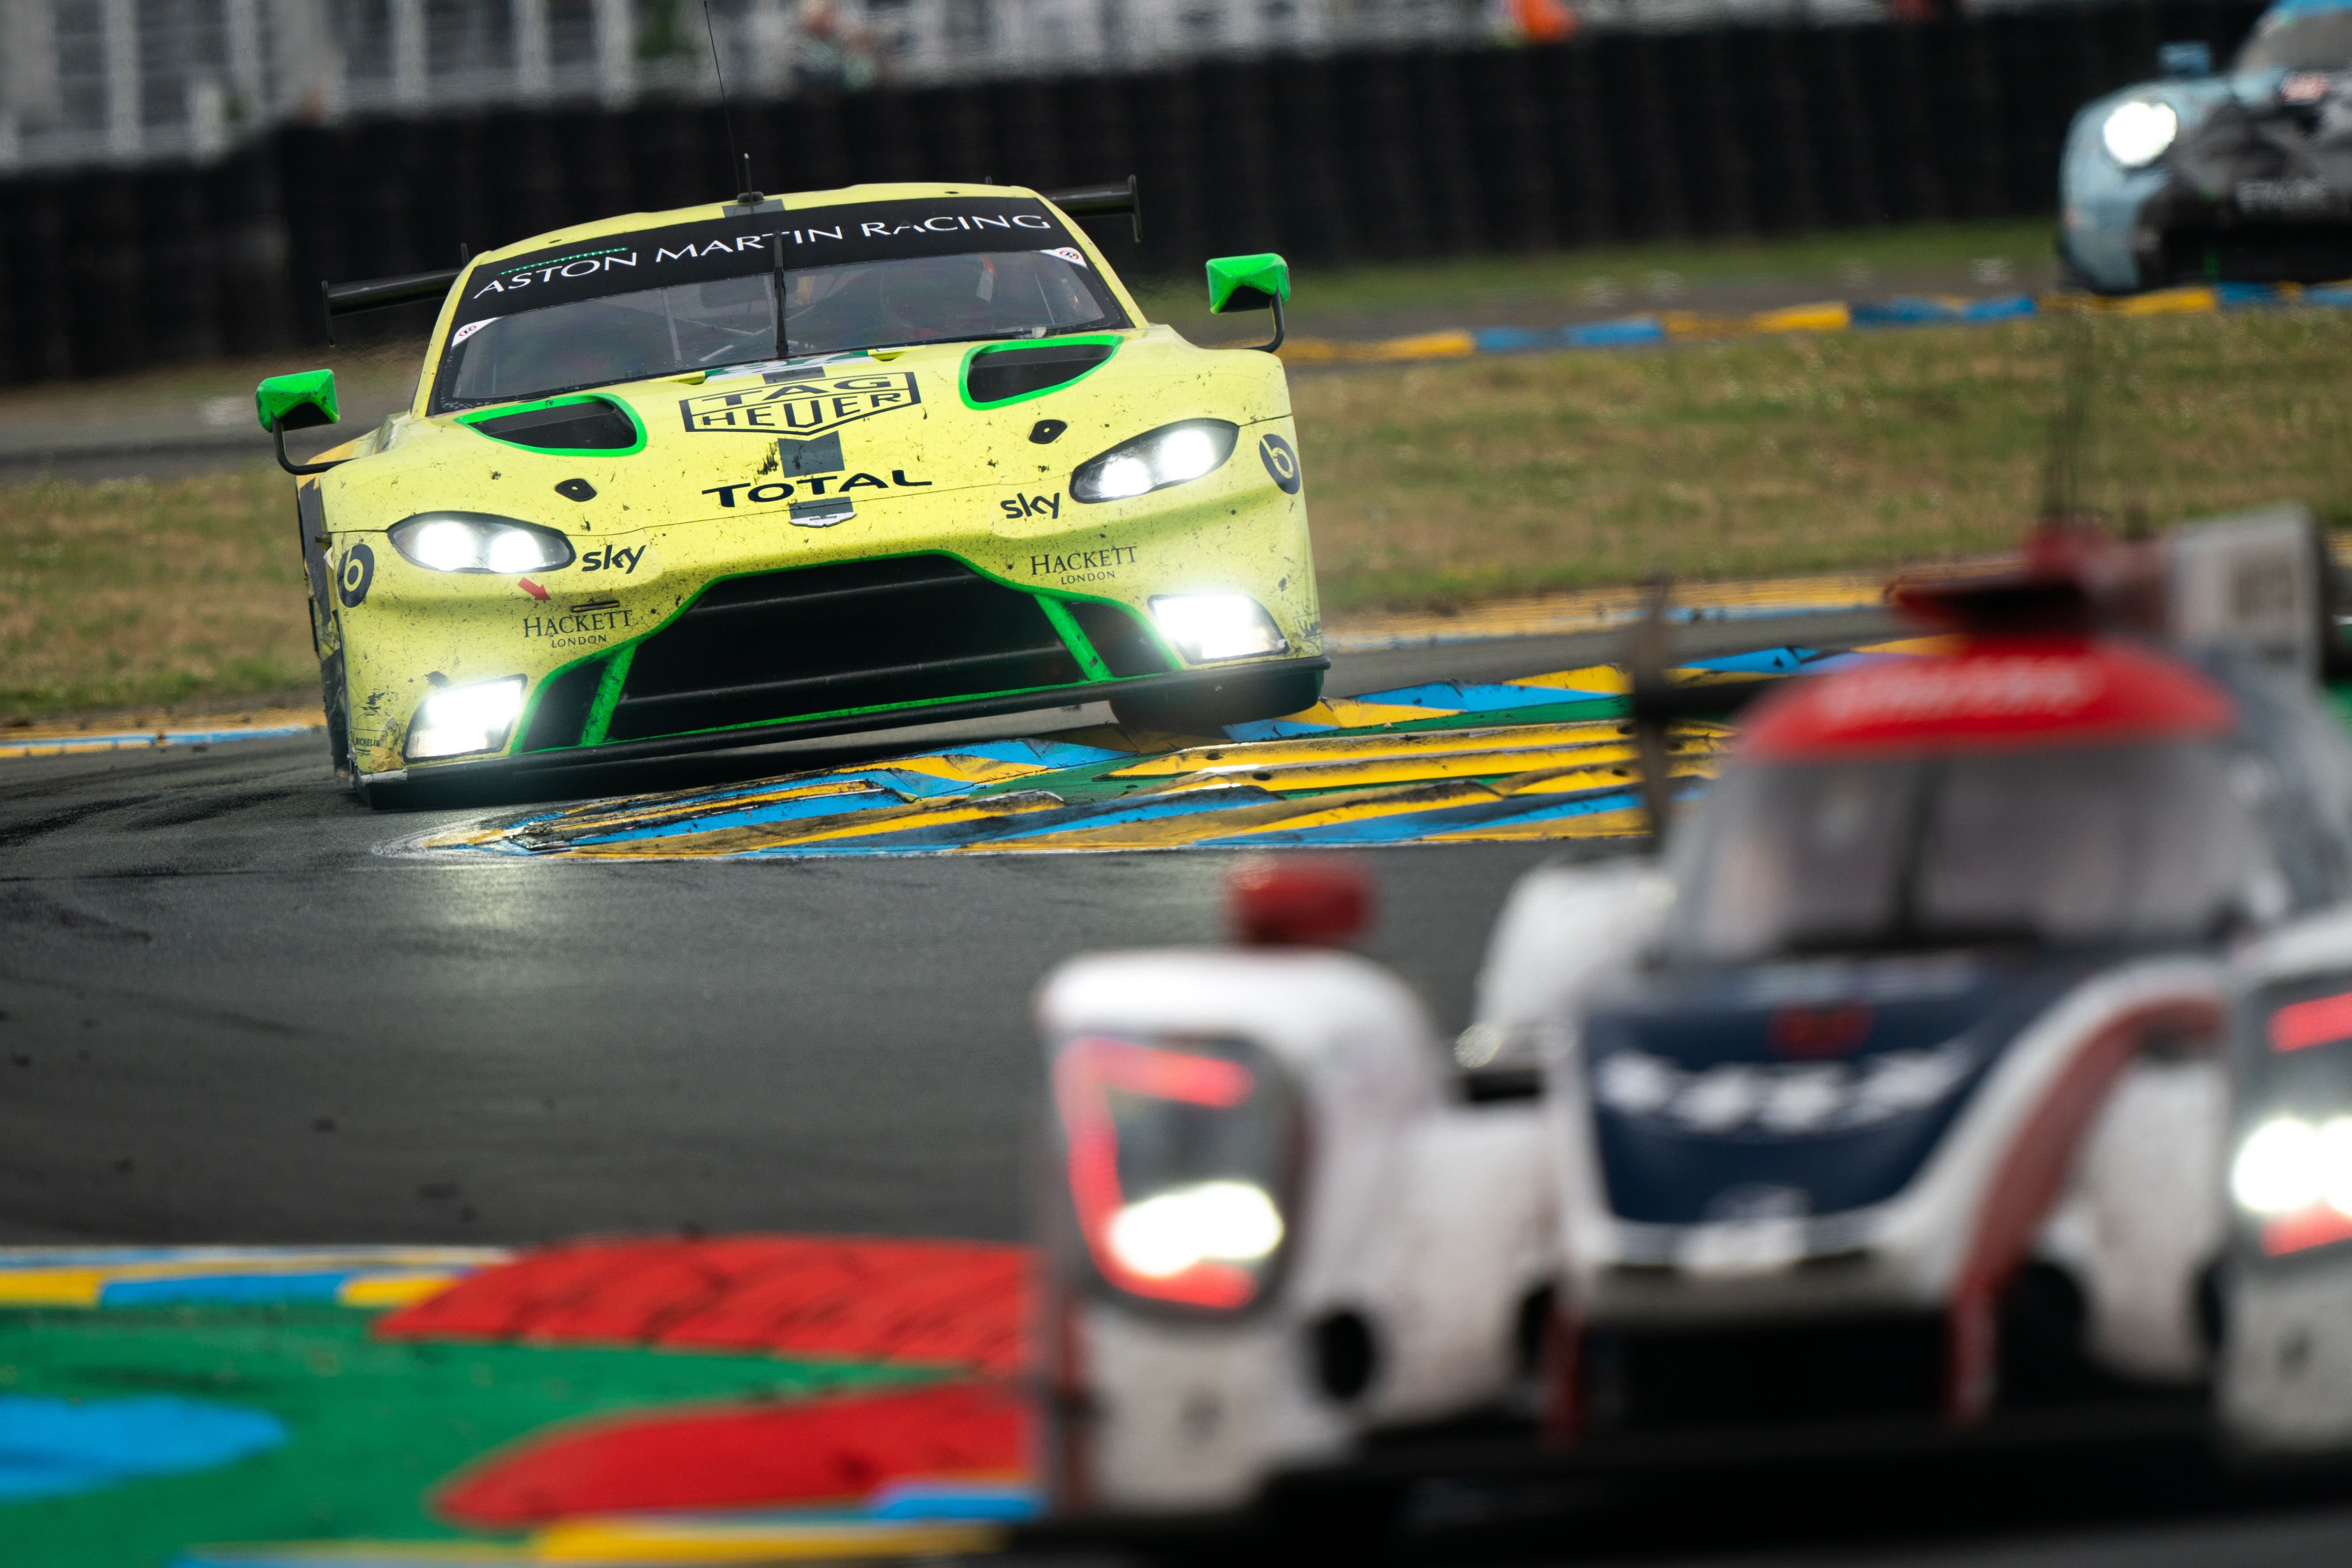 2018/19 World Endurance Championship Le Mans 12th - 16th June 2019 Le Mans - France Photo: Nick Dungan / Drew Gibson Photography